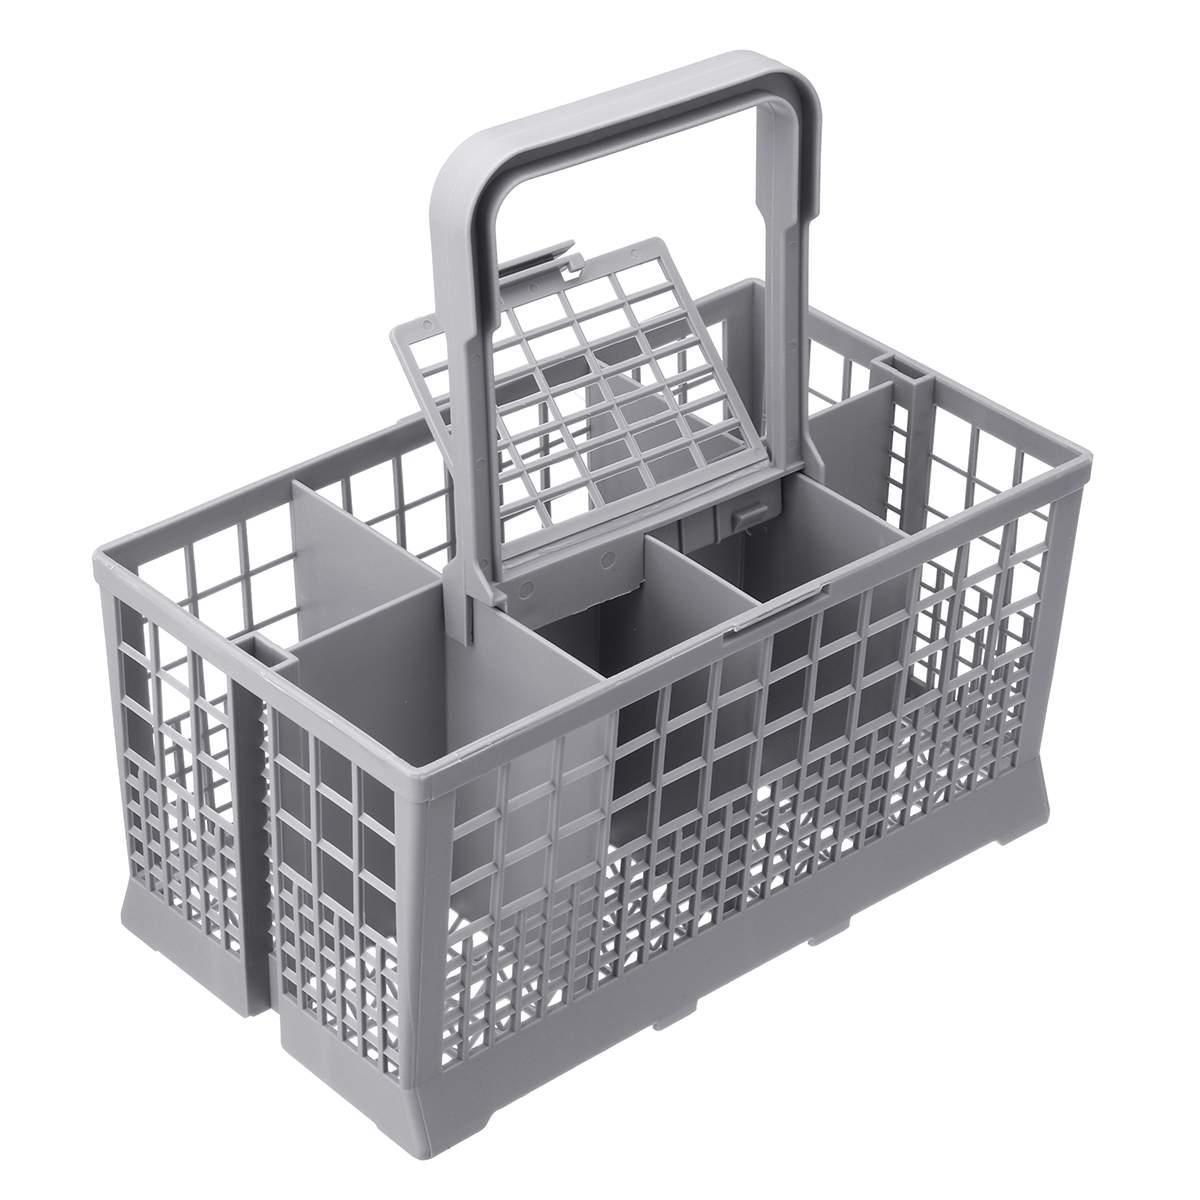 Universal Dishwasher Cutlery Basket 24x24x12cm Dish Washer Parts Plastic Storage Basket For Whirlpool Maytag Dishwashers